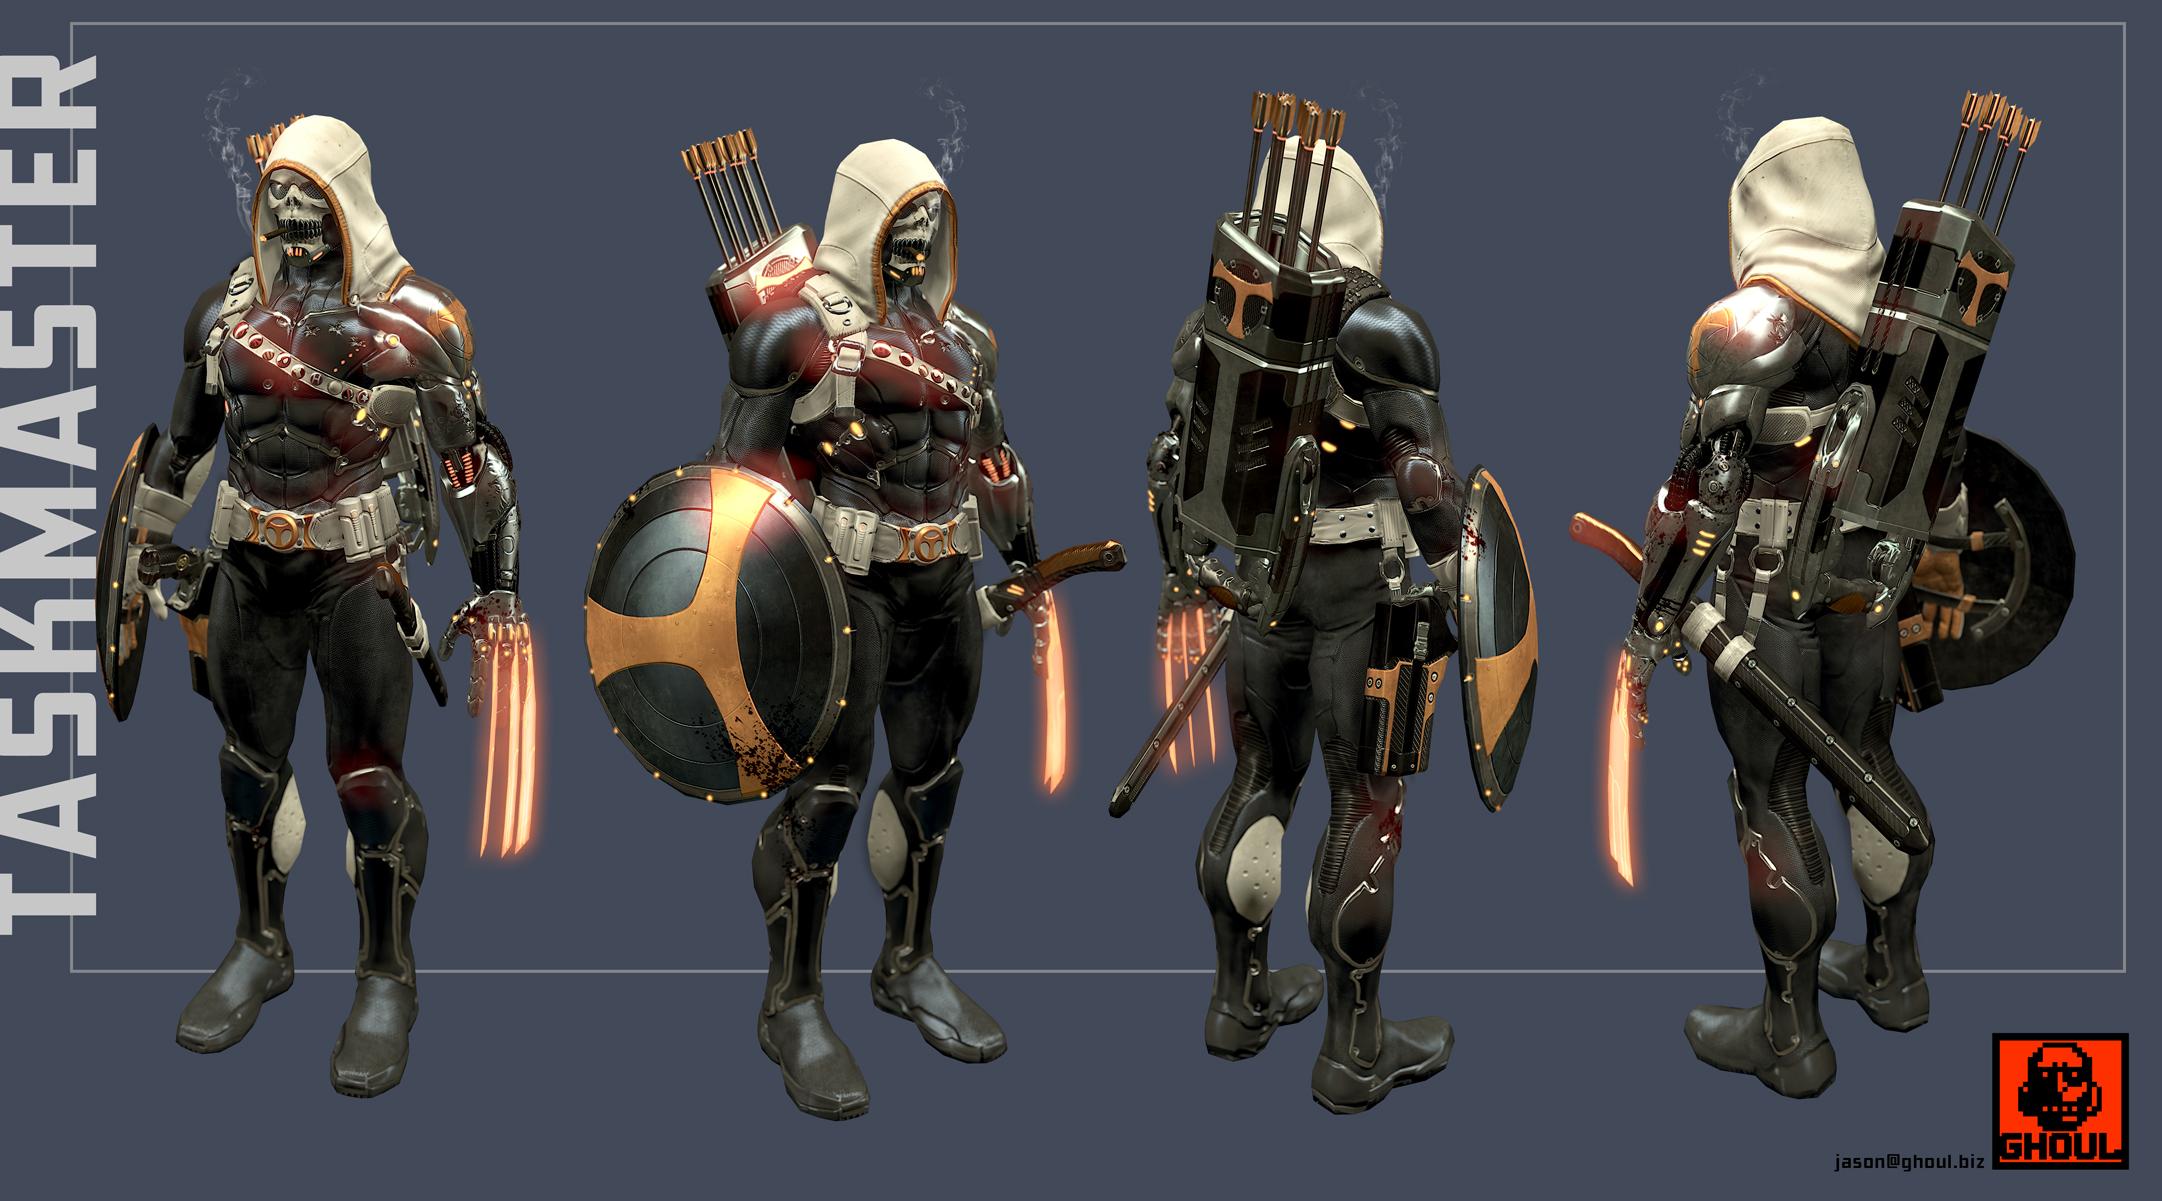 Taskmaster Backgrounds on Wallpapers Vista